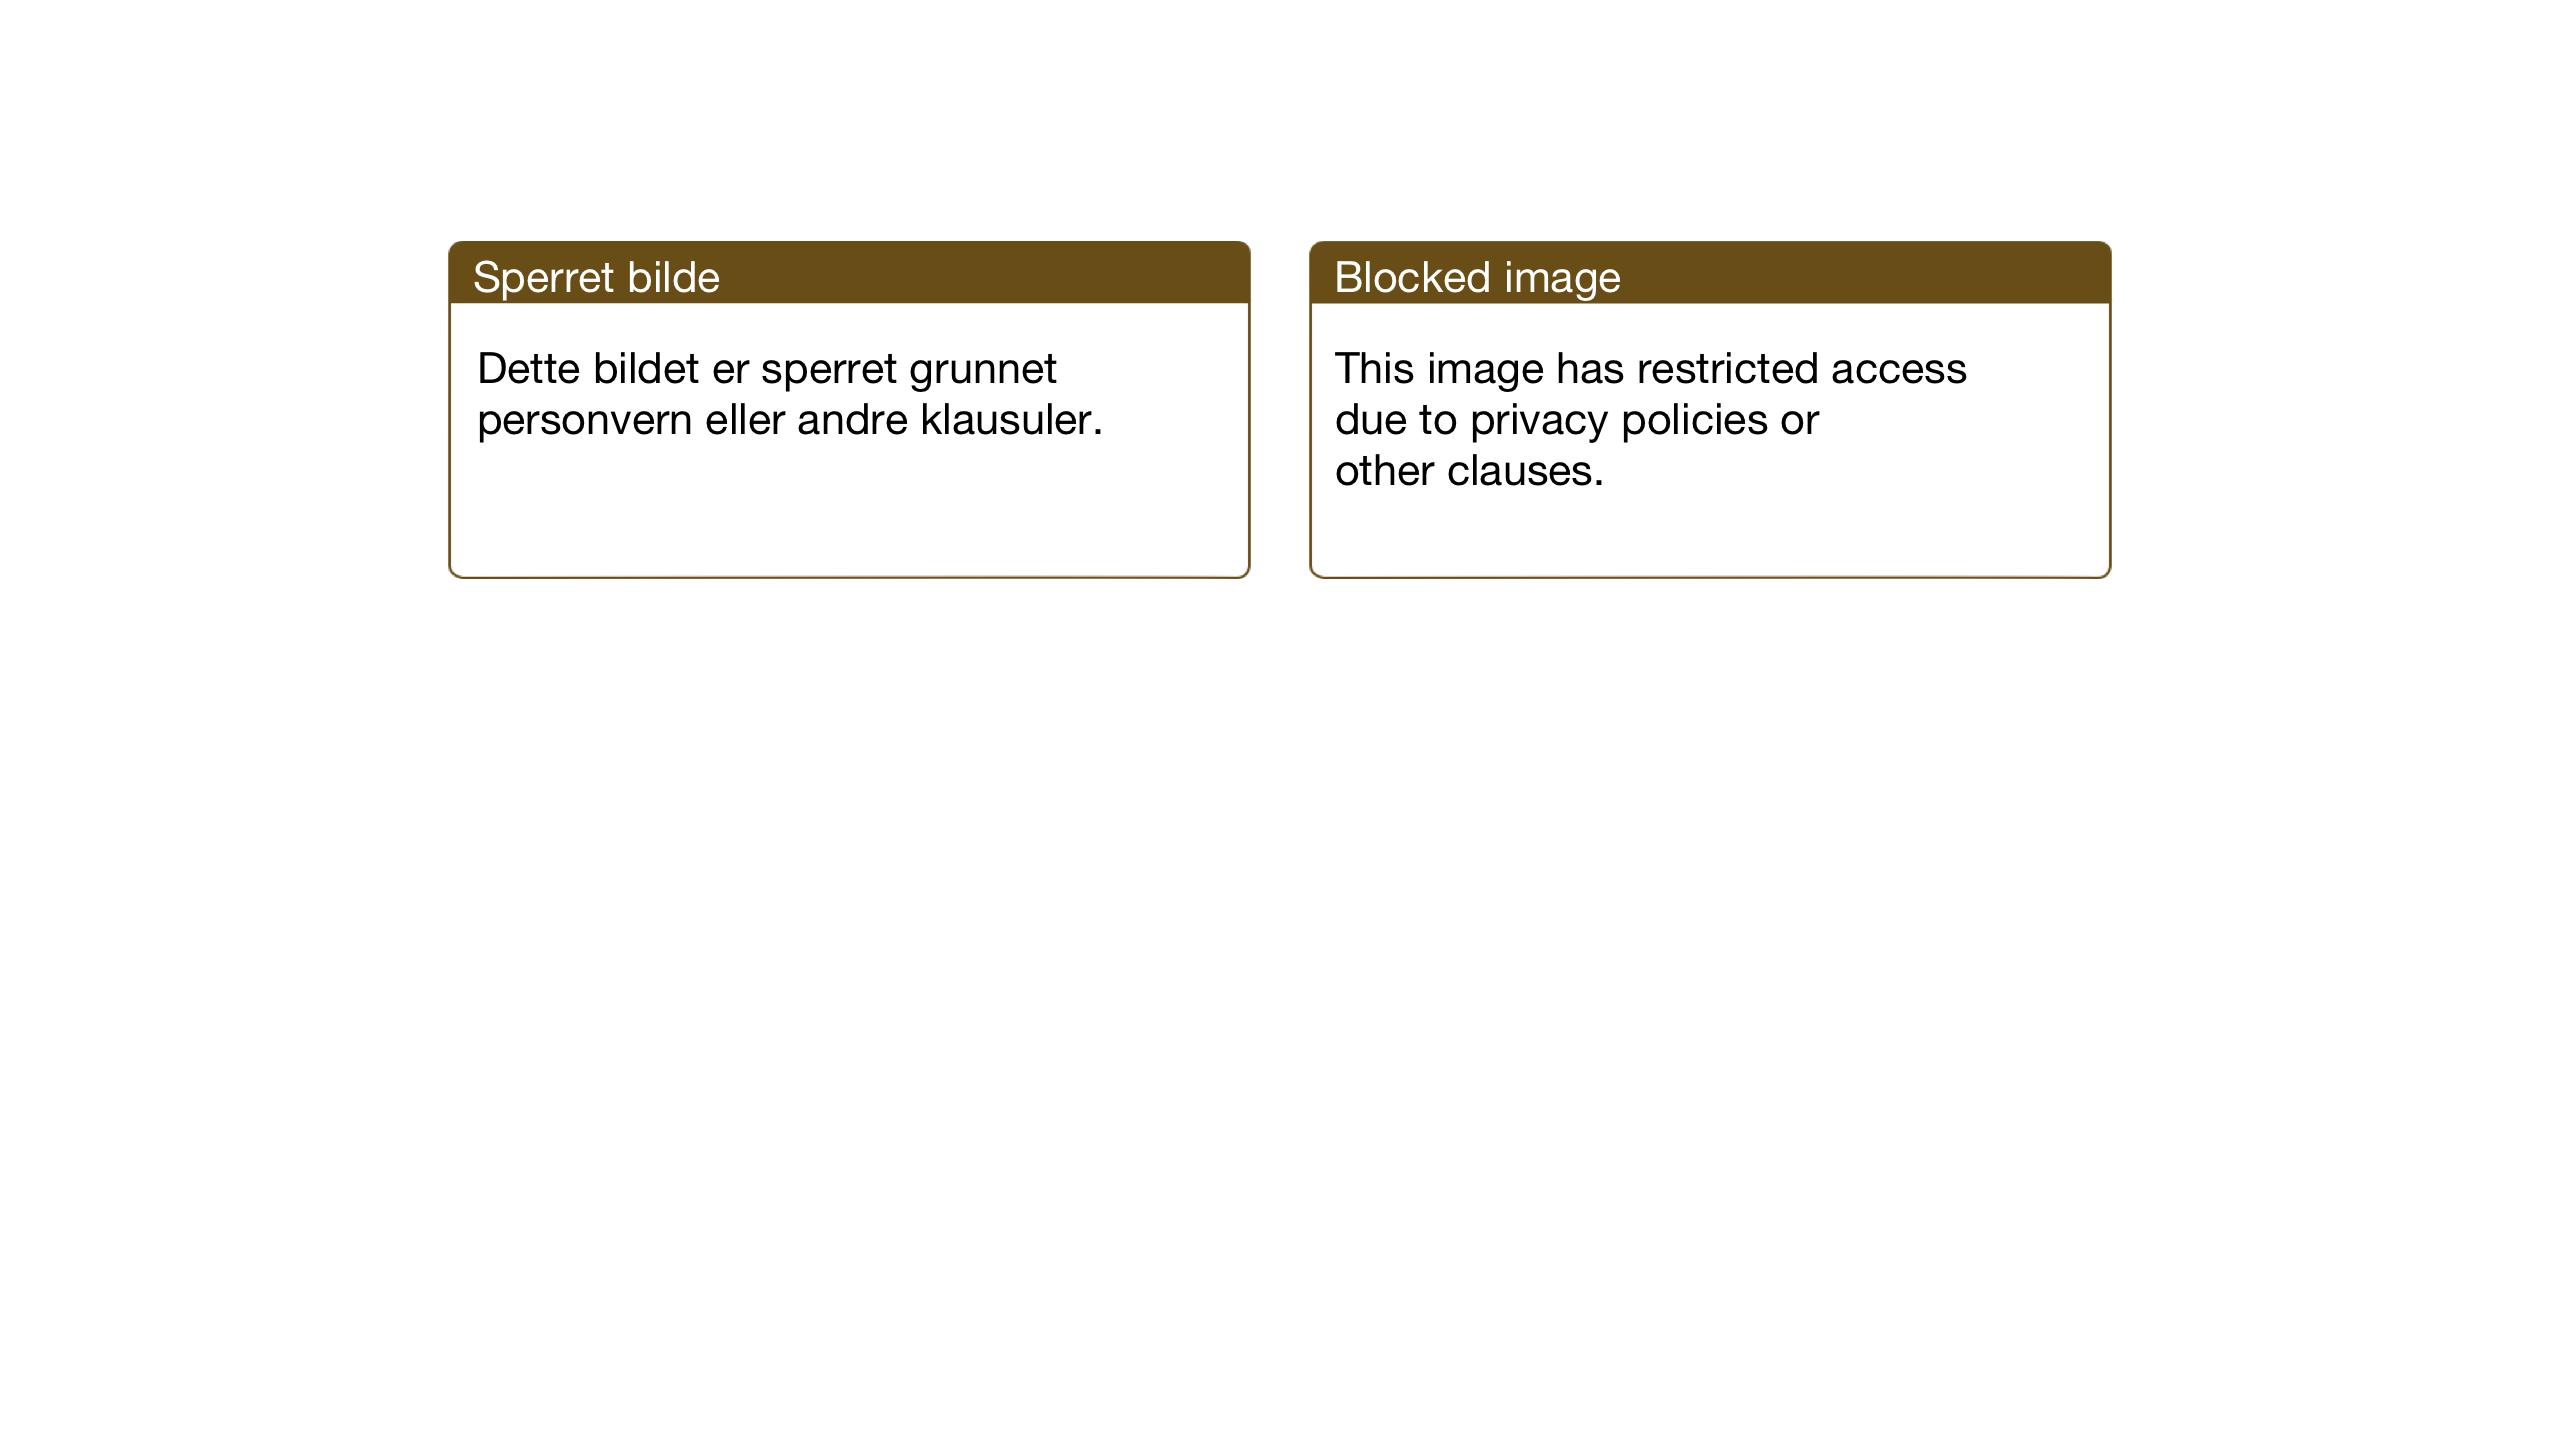 SAB, Domkirken Sokneprestembete, H/Haa: Ministerialbok nr. C 9, 1958-2001, s. 181b-182a